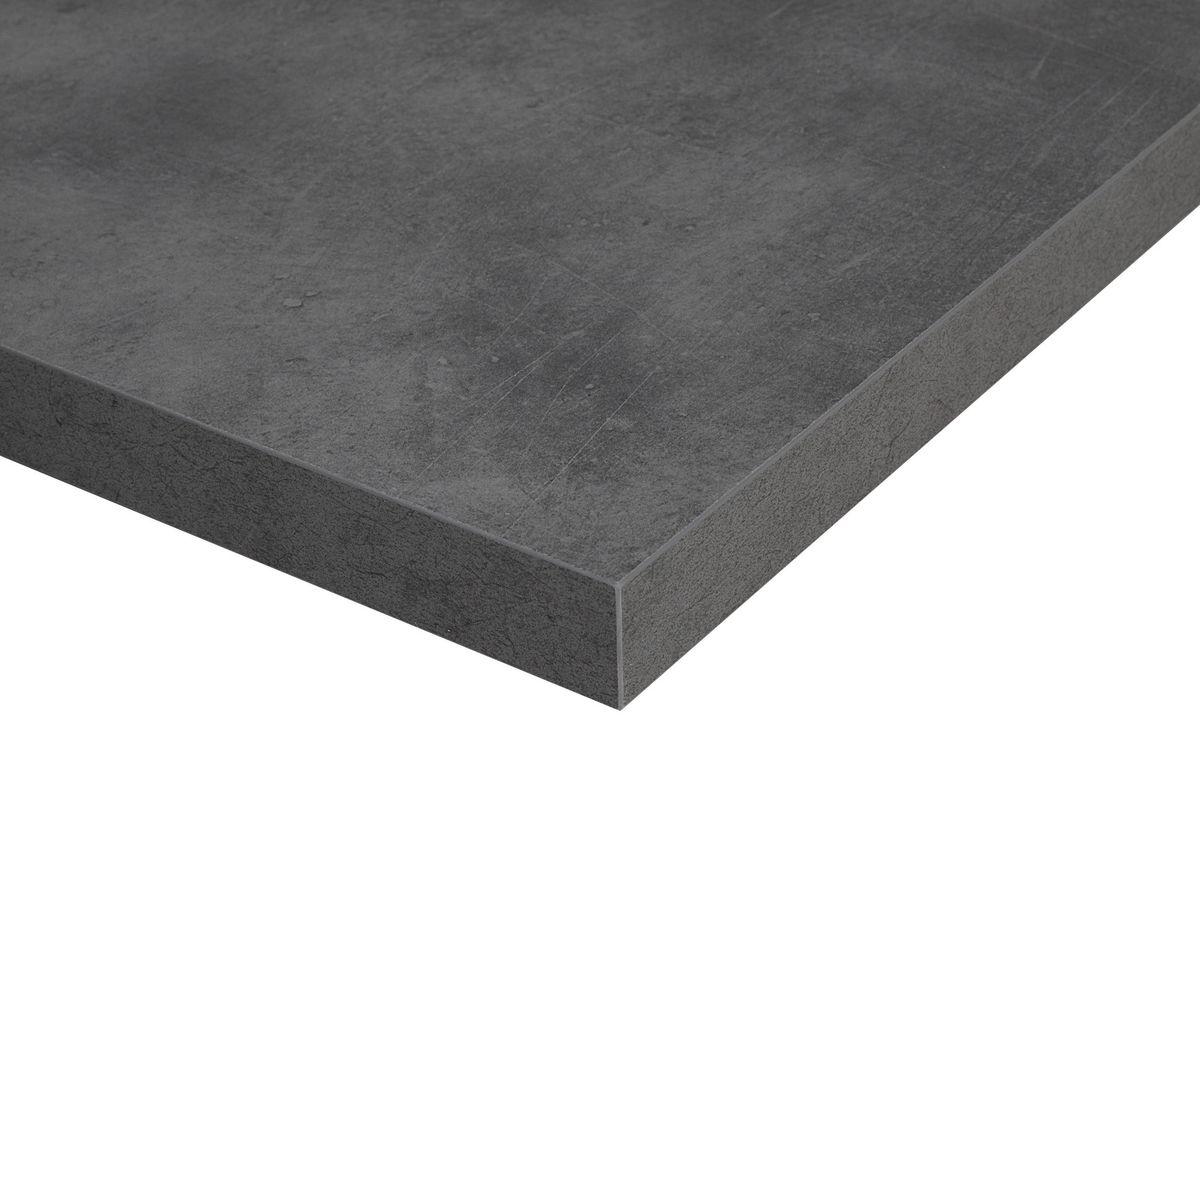 Top cucina grigio perfect colore pareti cucina bianca top - Top cucina laminato su misura ...